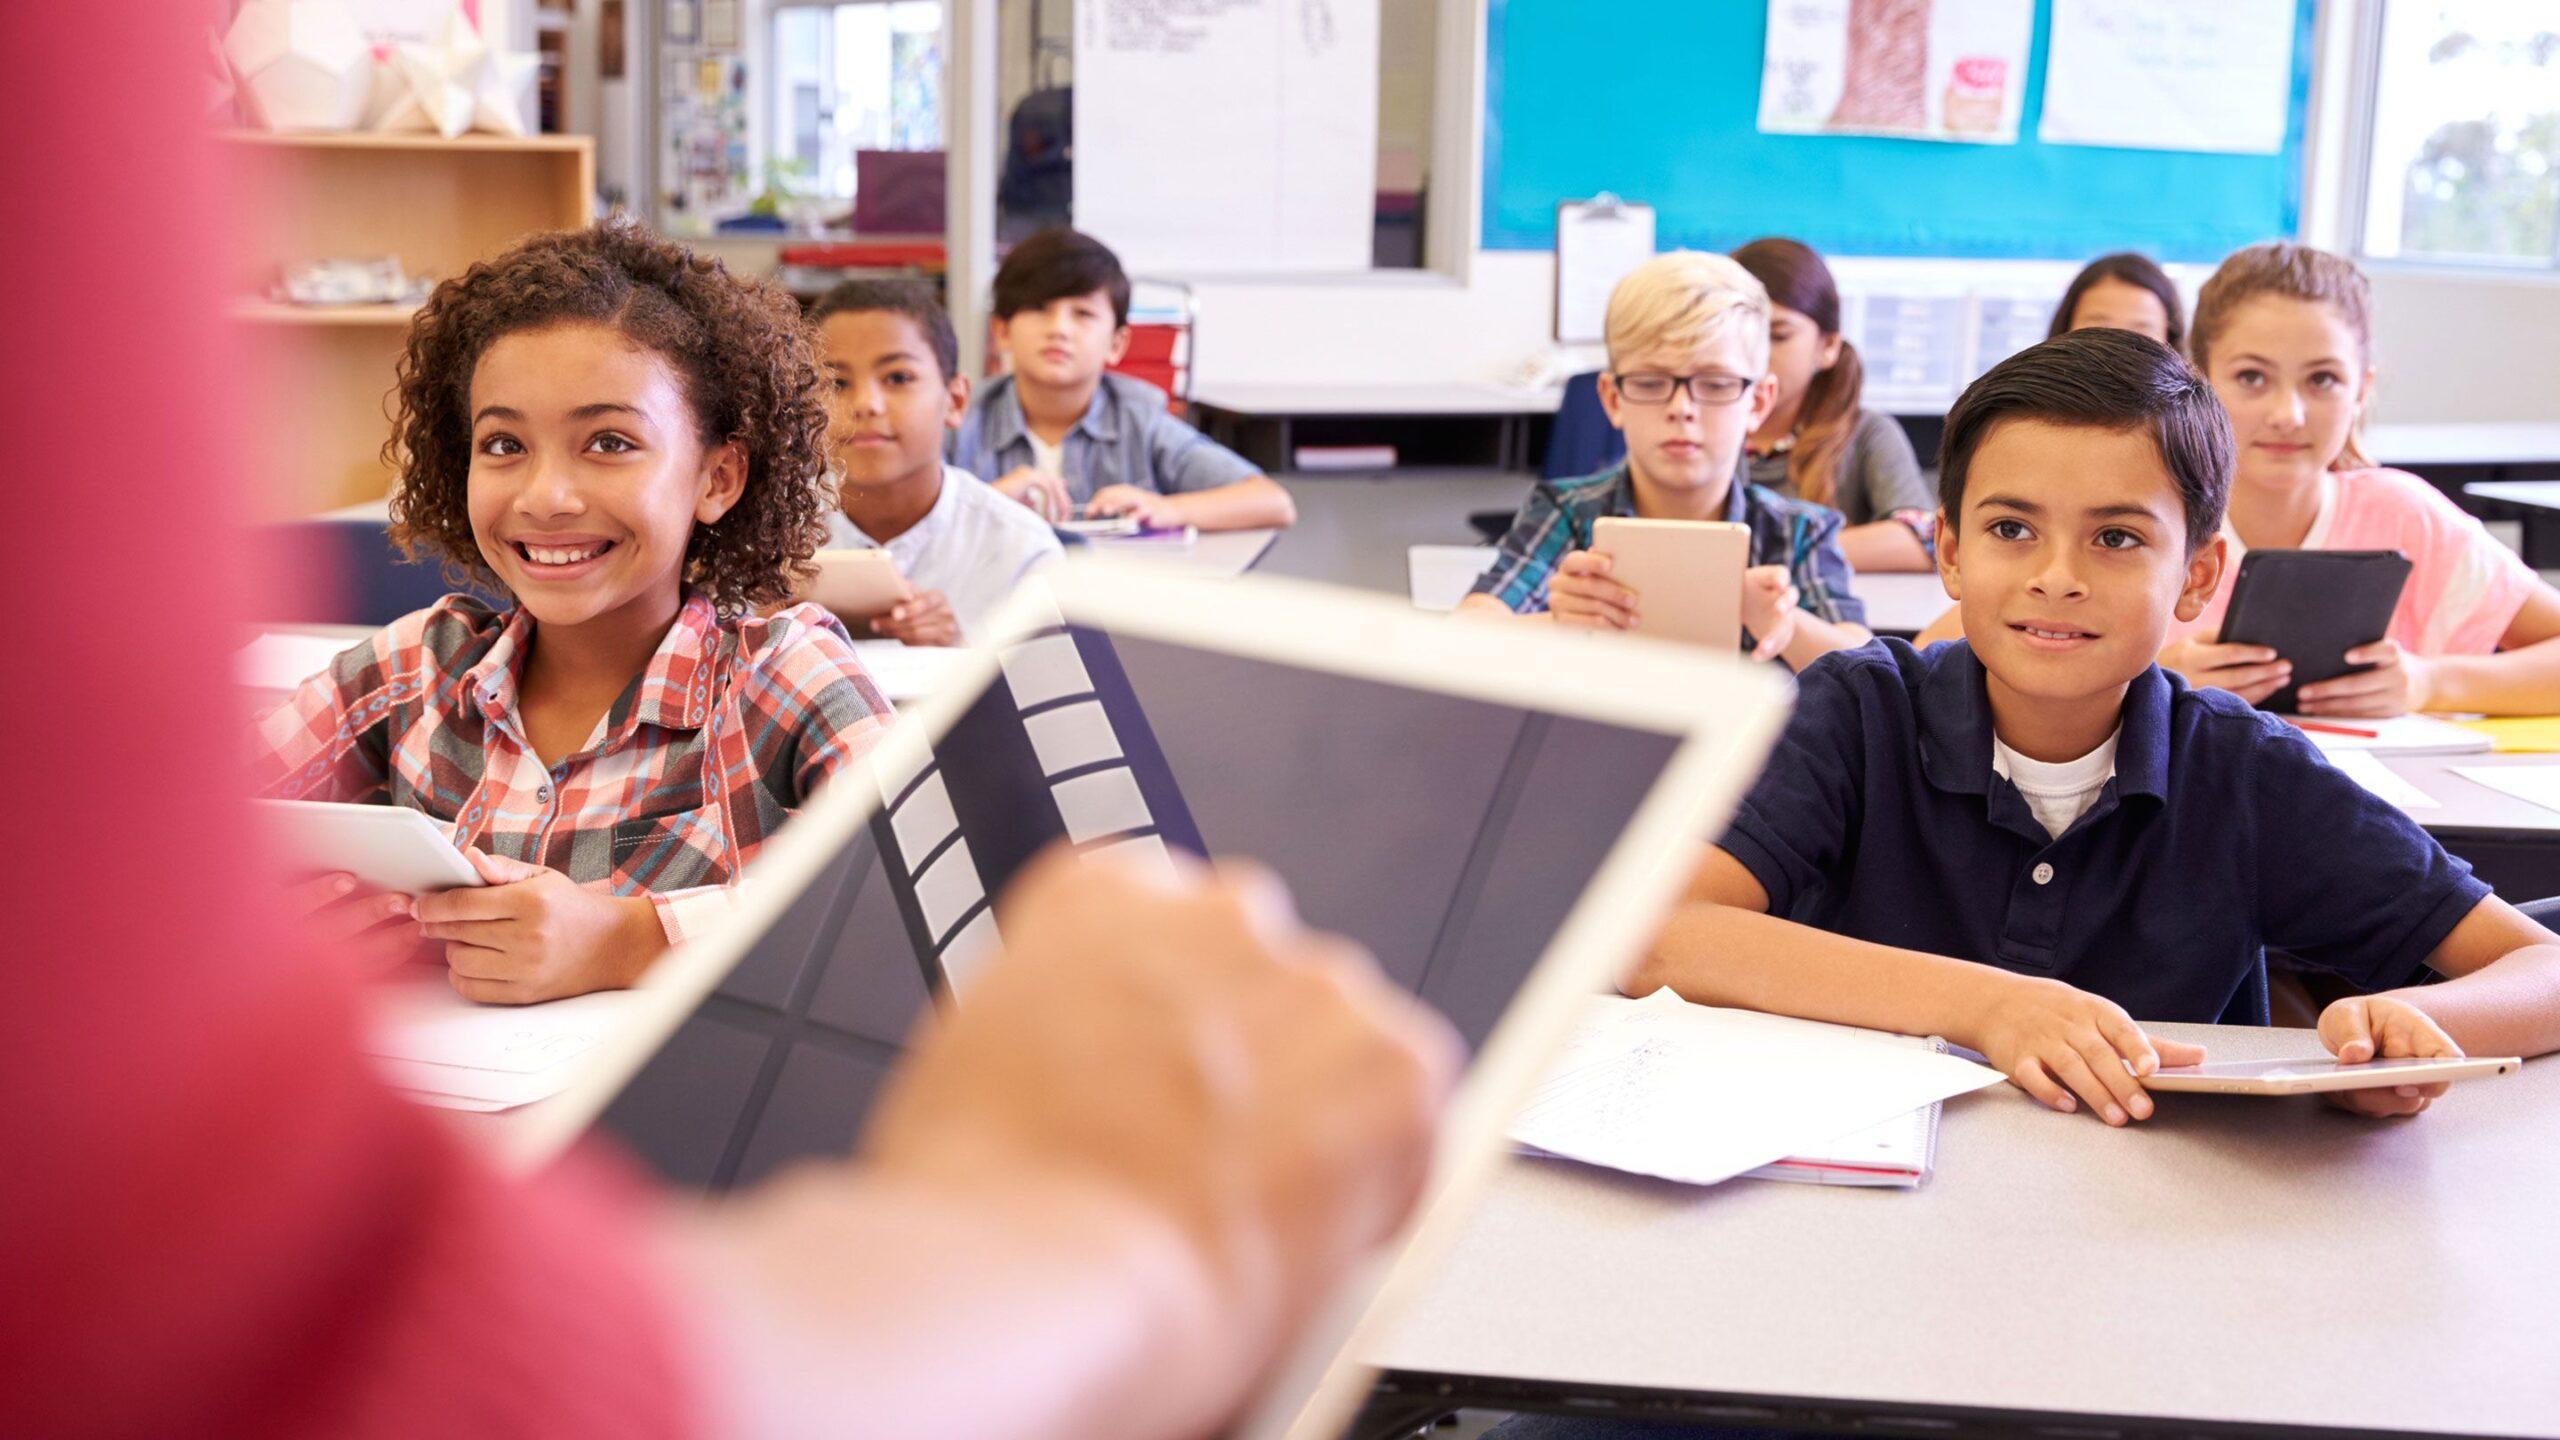 students learning using iPad